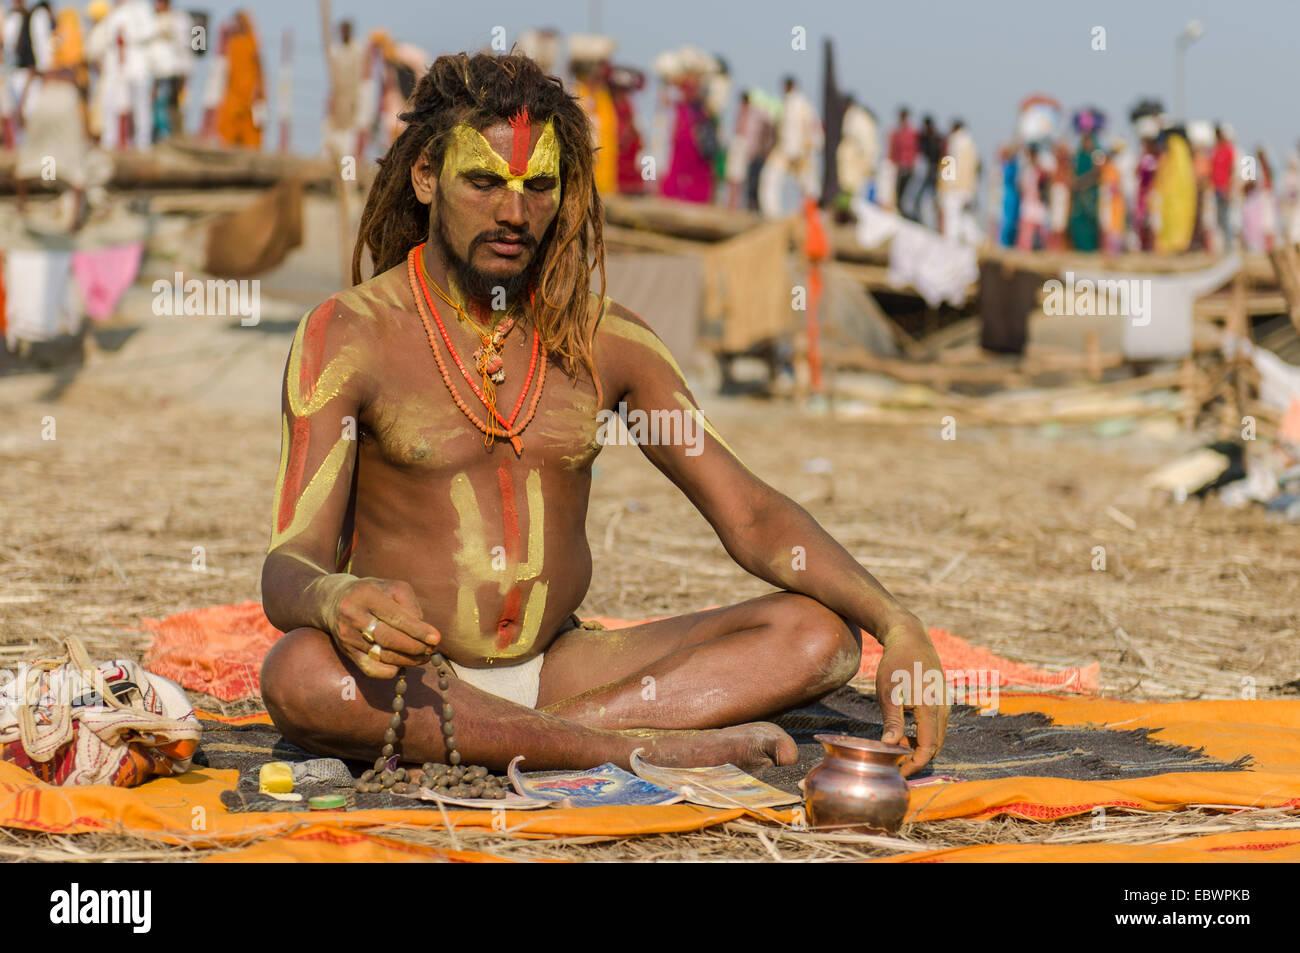 Shiva sadhu, holy man, meditating at the Sangam, the confluence of the rivers Ganges, Yamuna and Saraswati - Stock Image